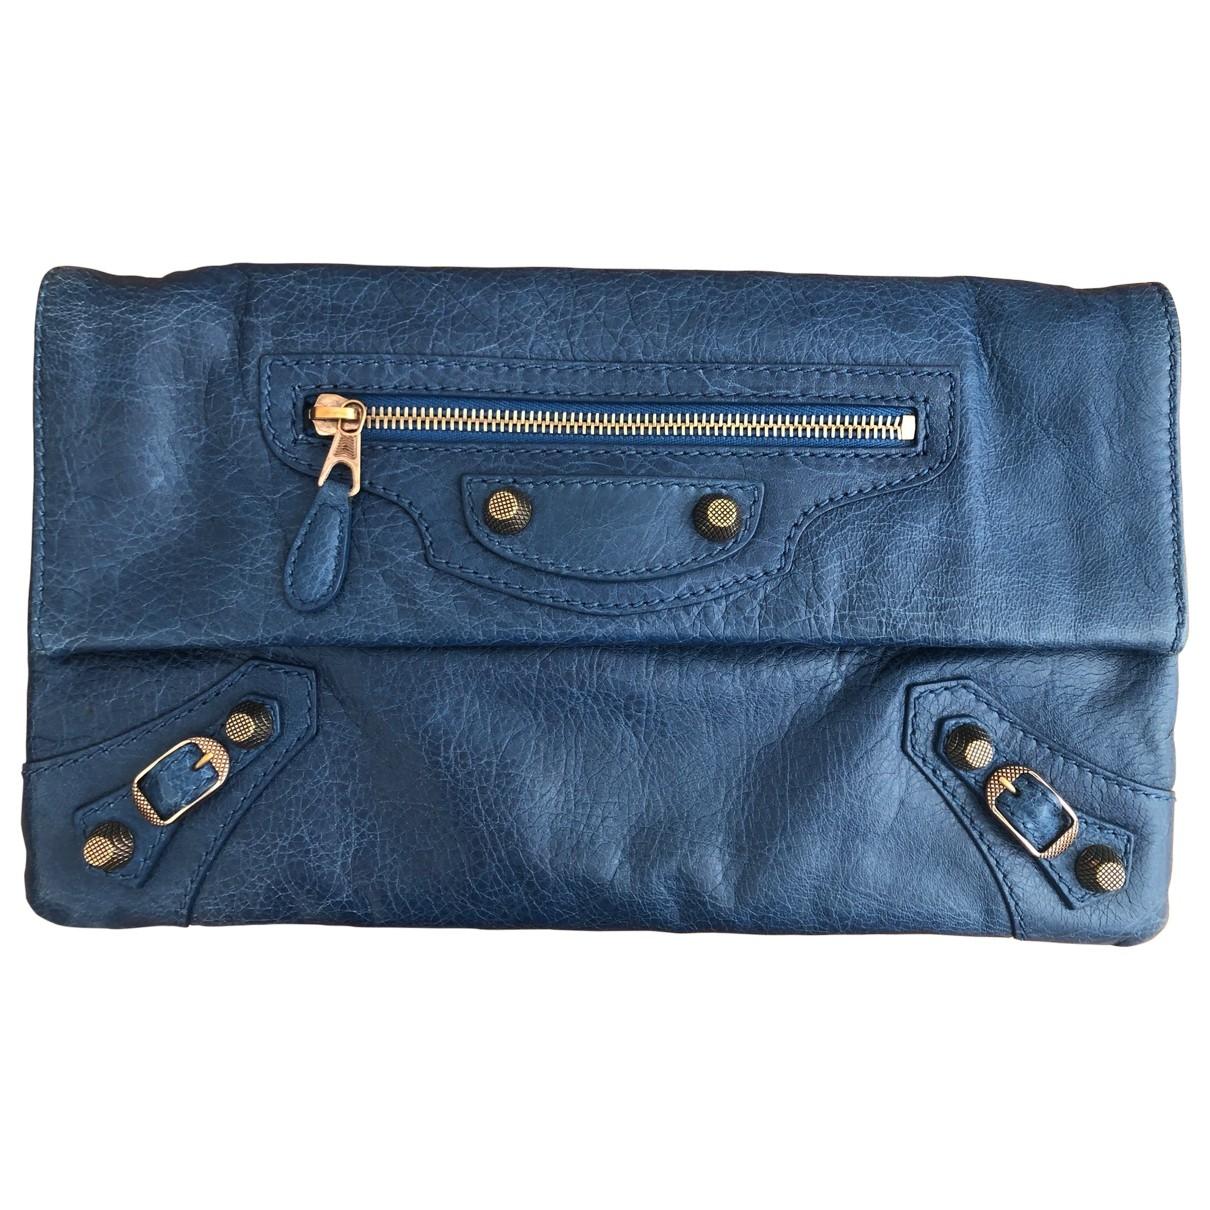 Balenciaga - Pochette Envelop pour femme en cuir - bleu